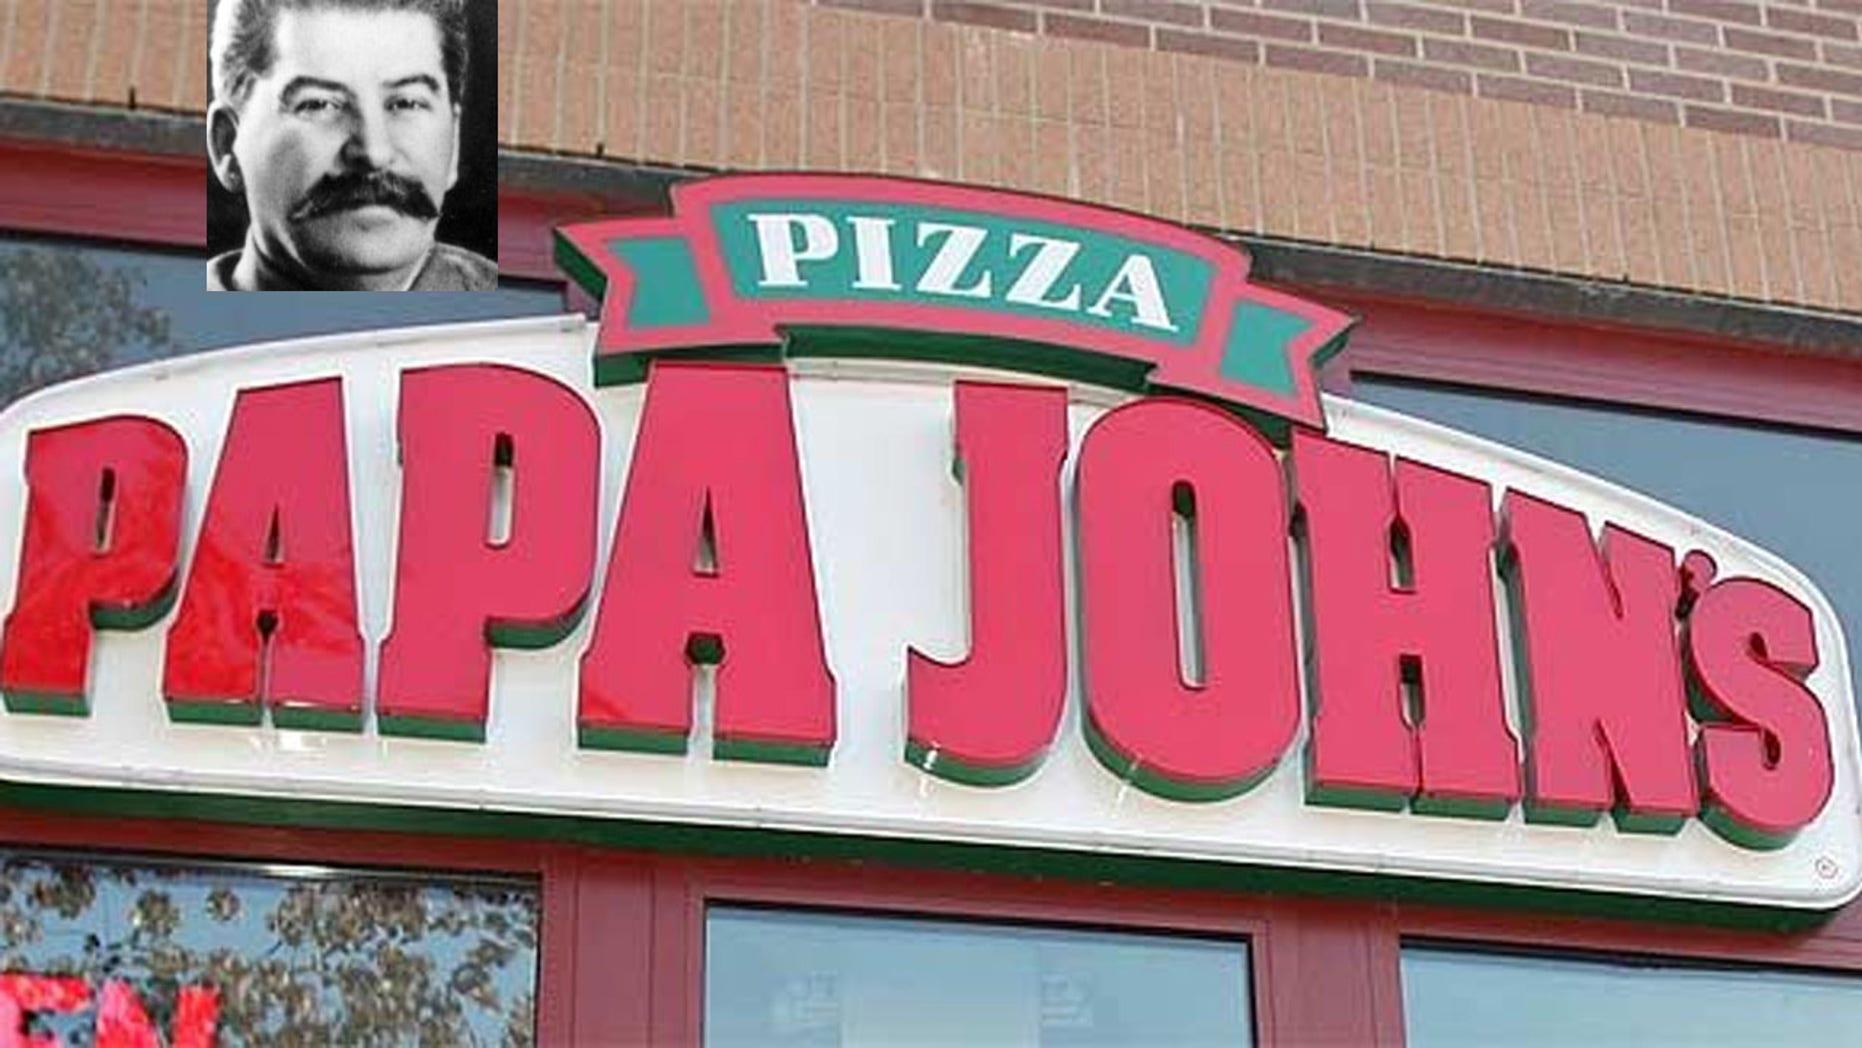 Papa John's Pizza has introduced a Josef Stalin promotion code.